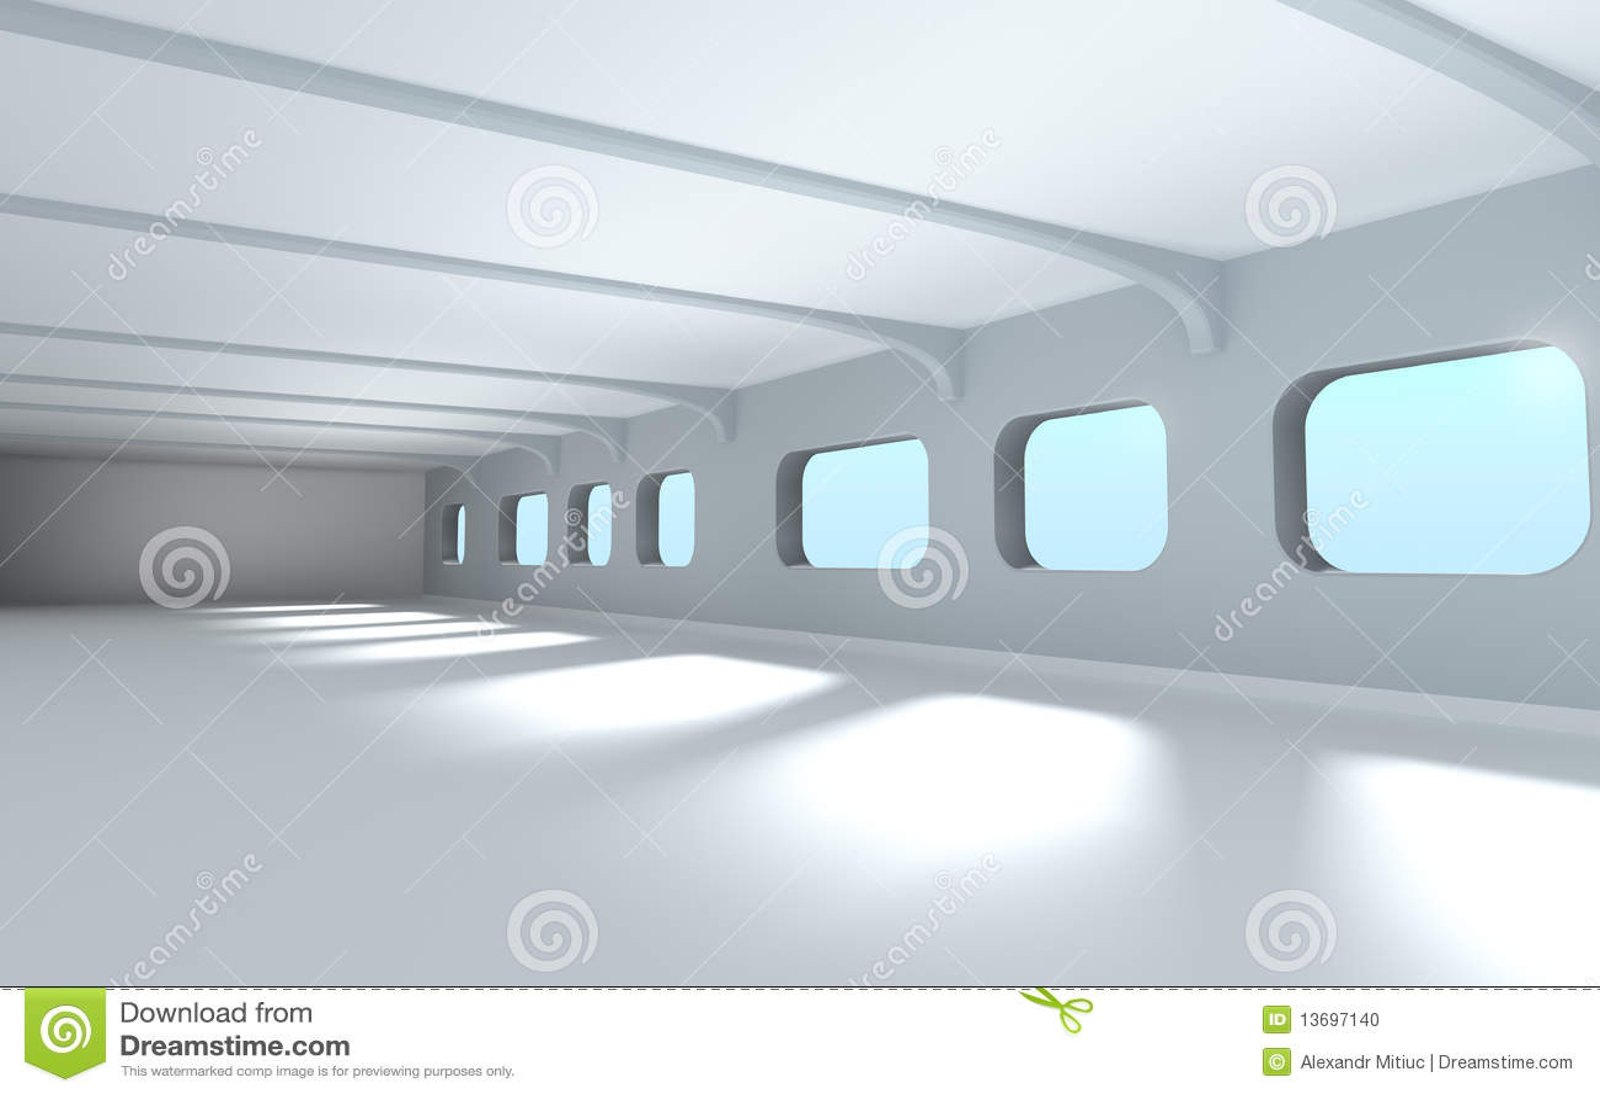 Modern Architecture Interior modern architecture interior stock photo - image: 13697140